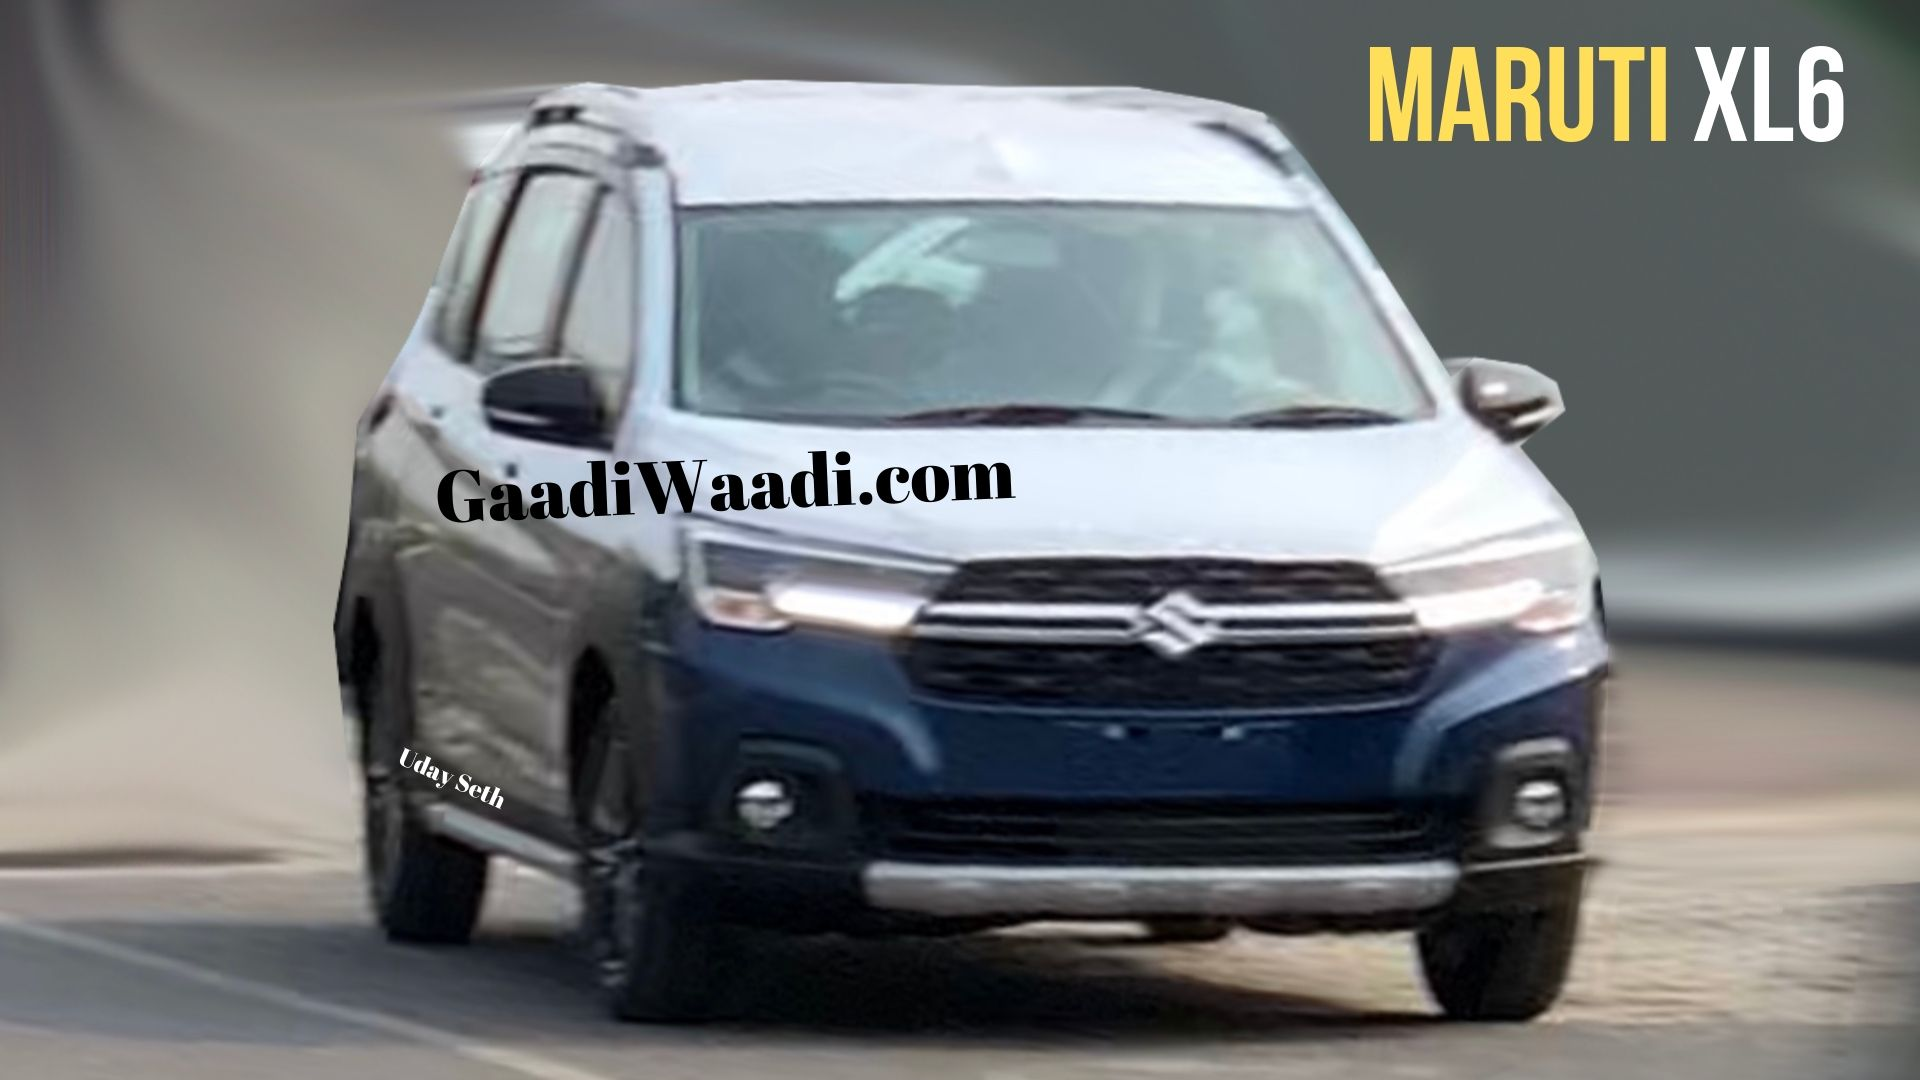 Maruti Suzuki XL6 Front Design Revealed Completely In New ...